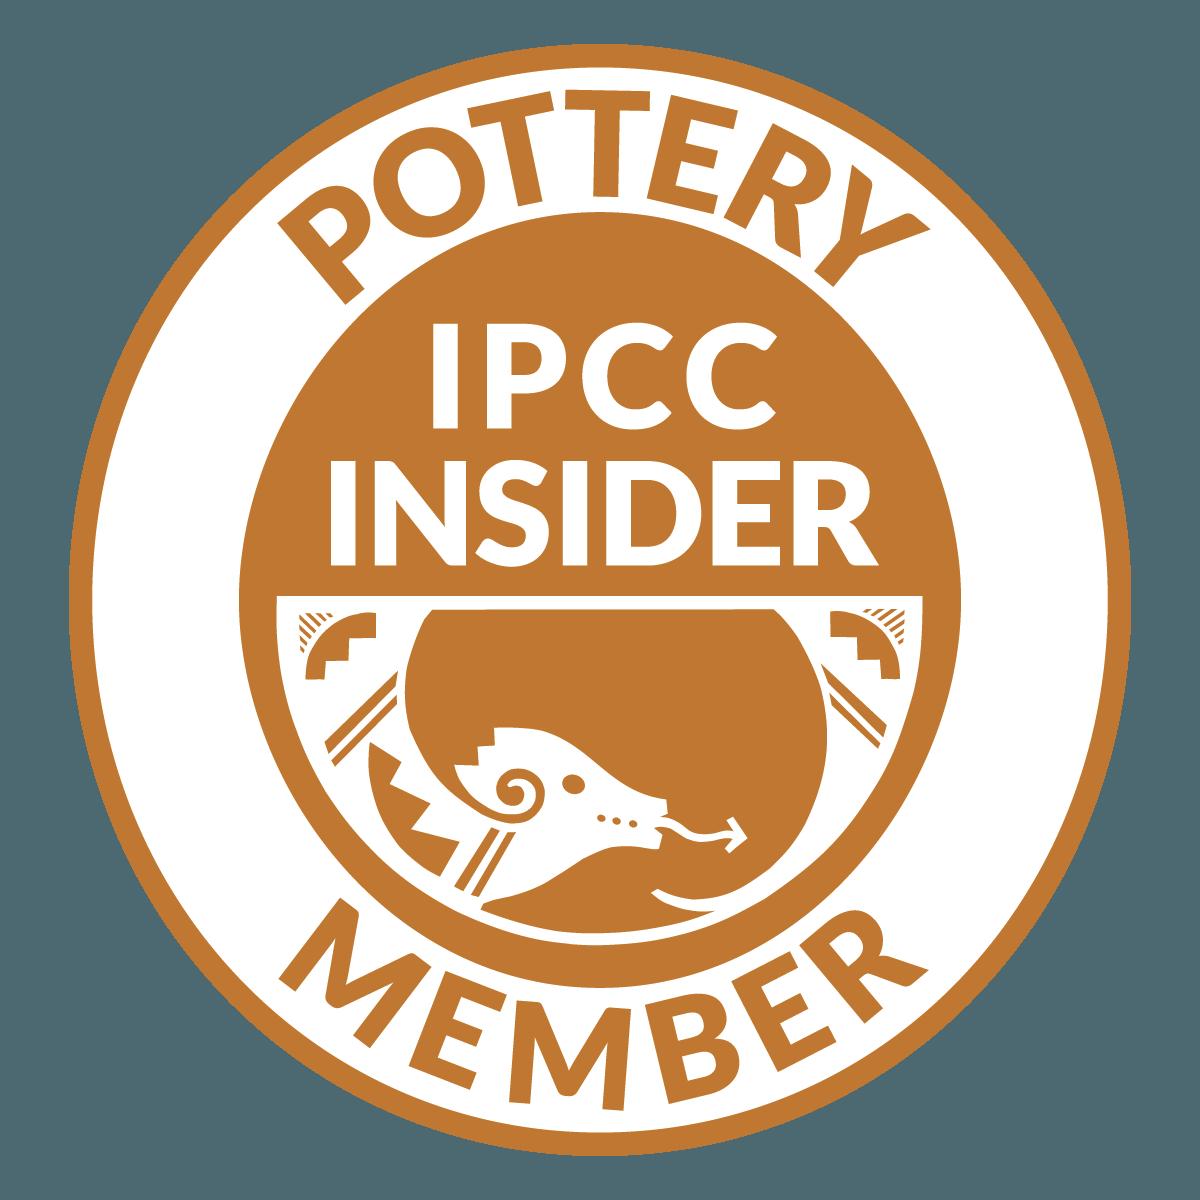 Pottery Indian Pueblo Cultural Center Membership Level